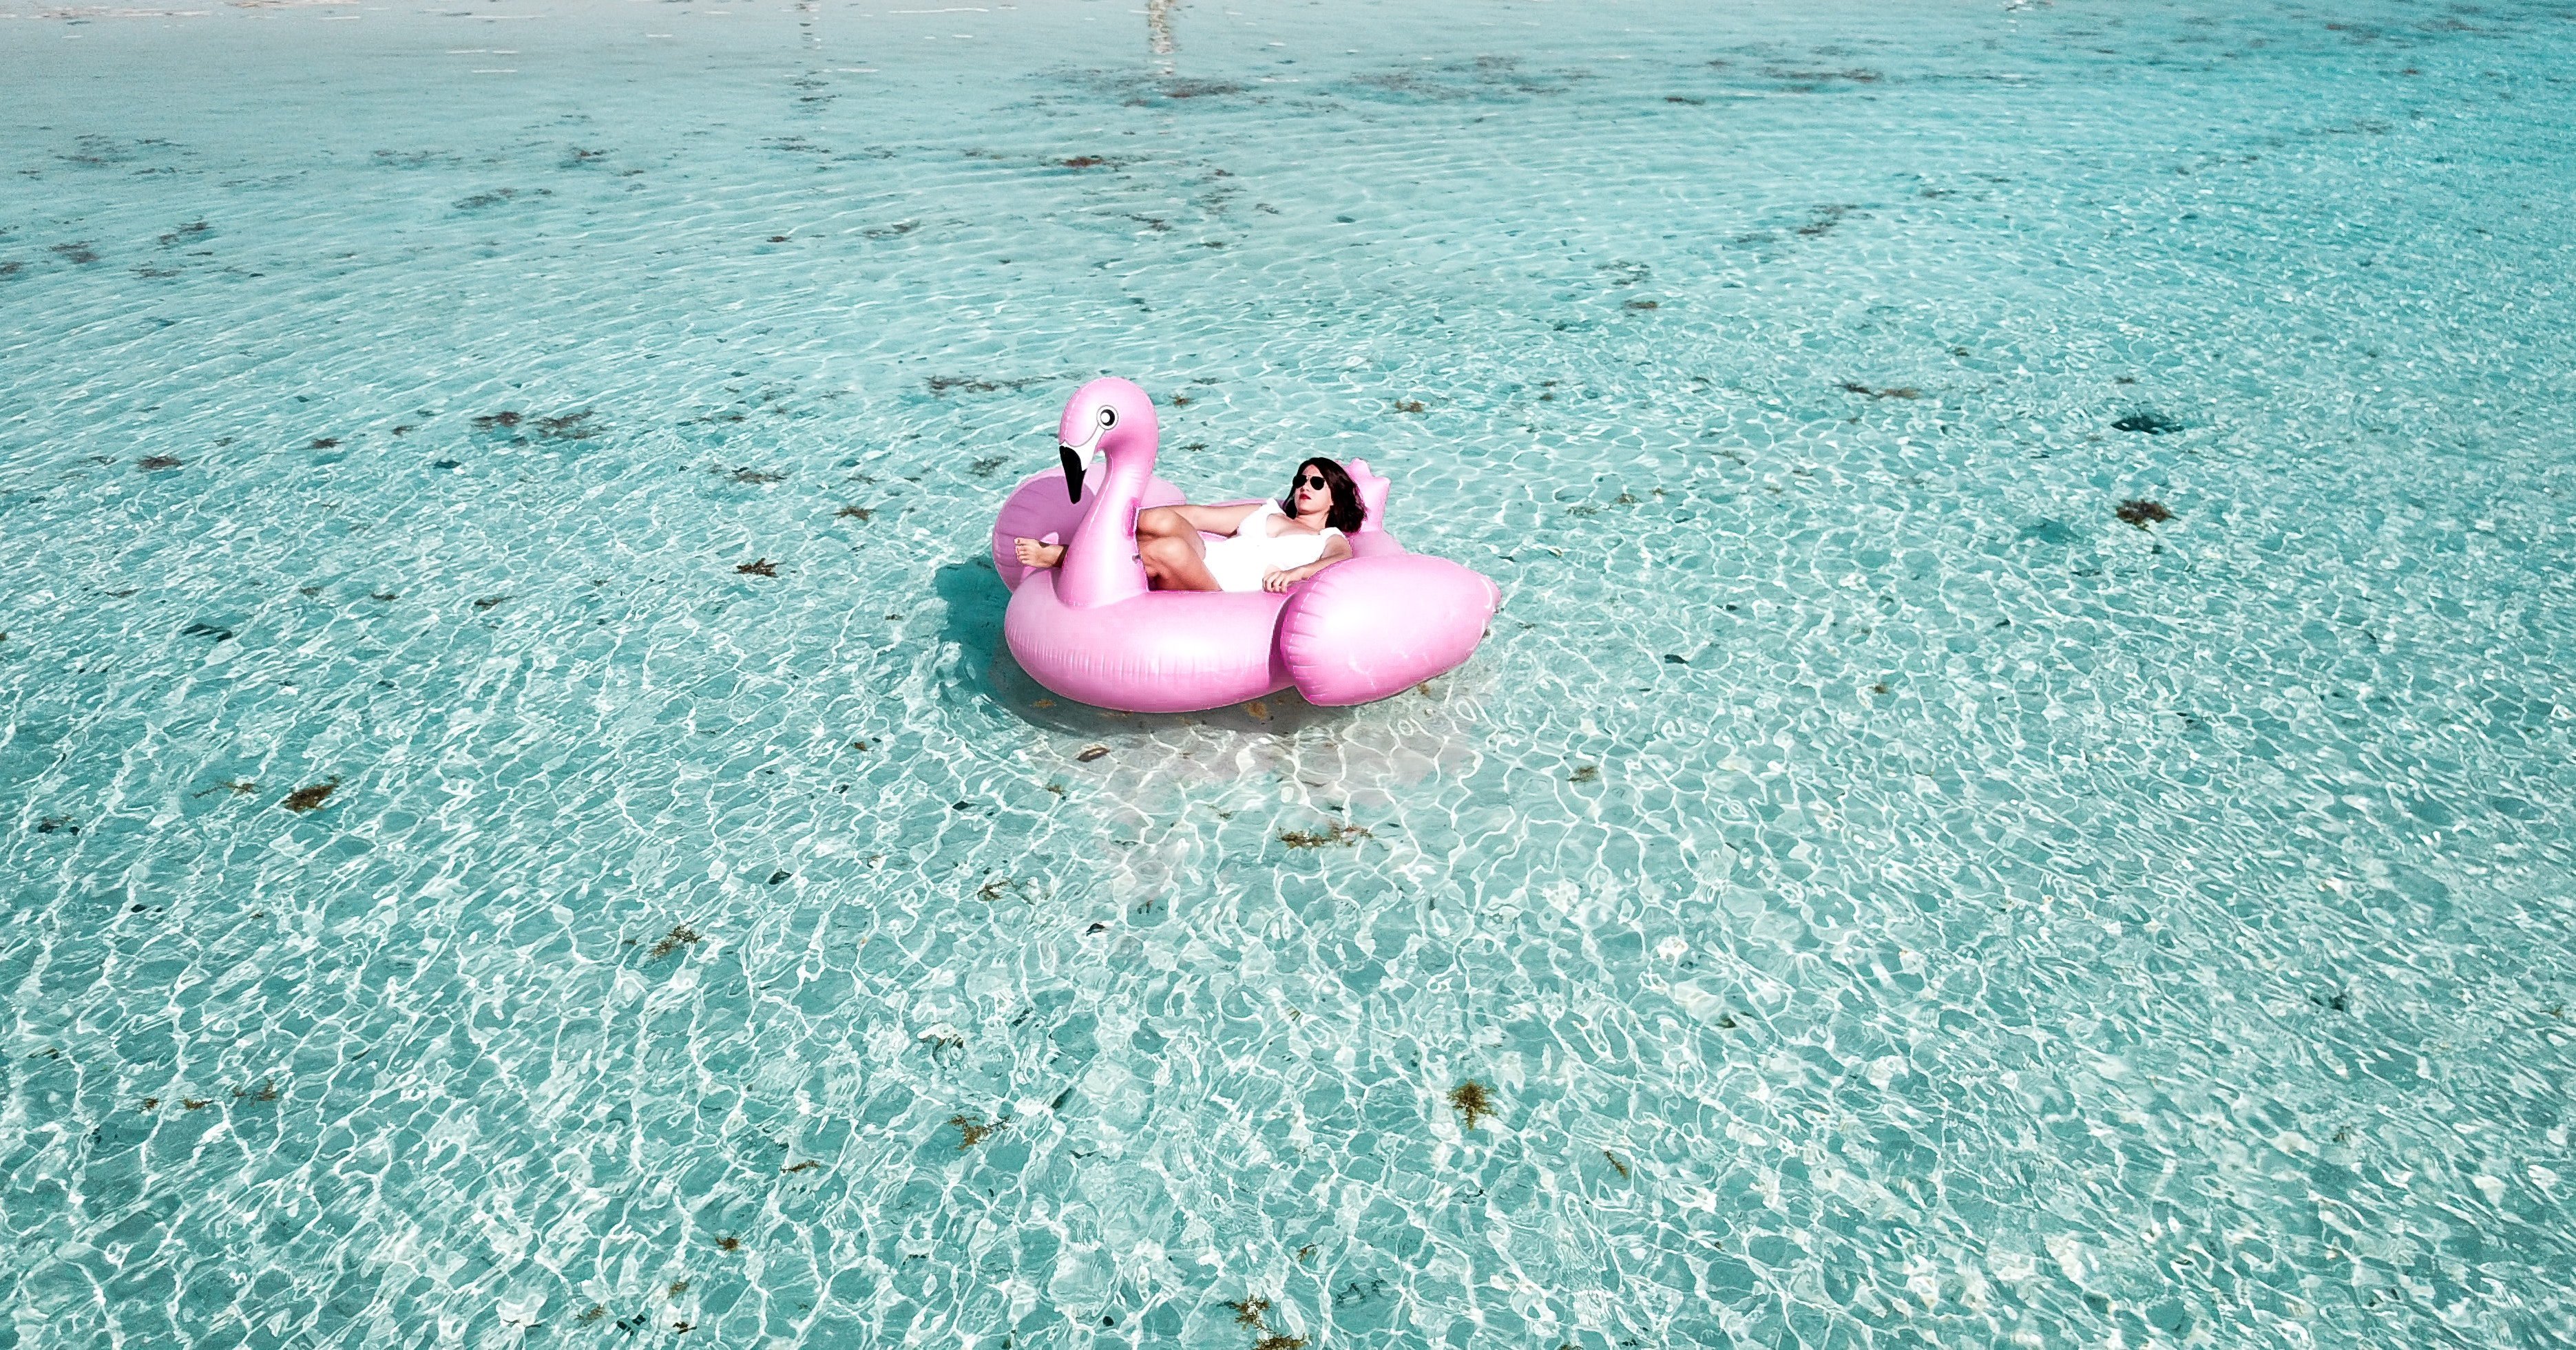 Woman Lying On Pink Flamingo Bouy Body Of Water